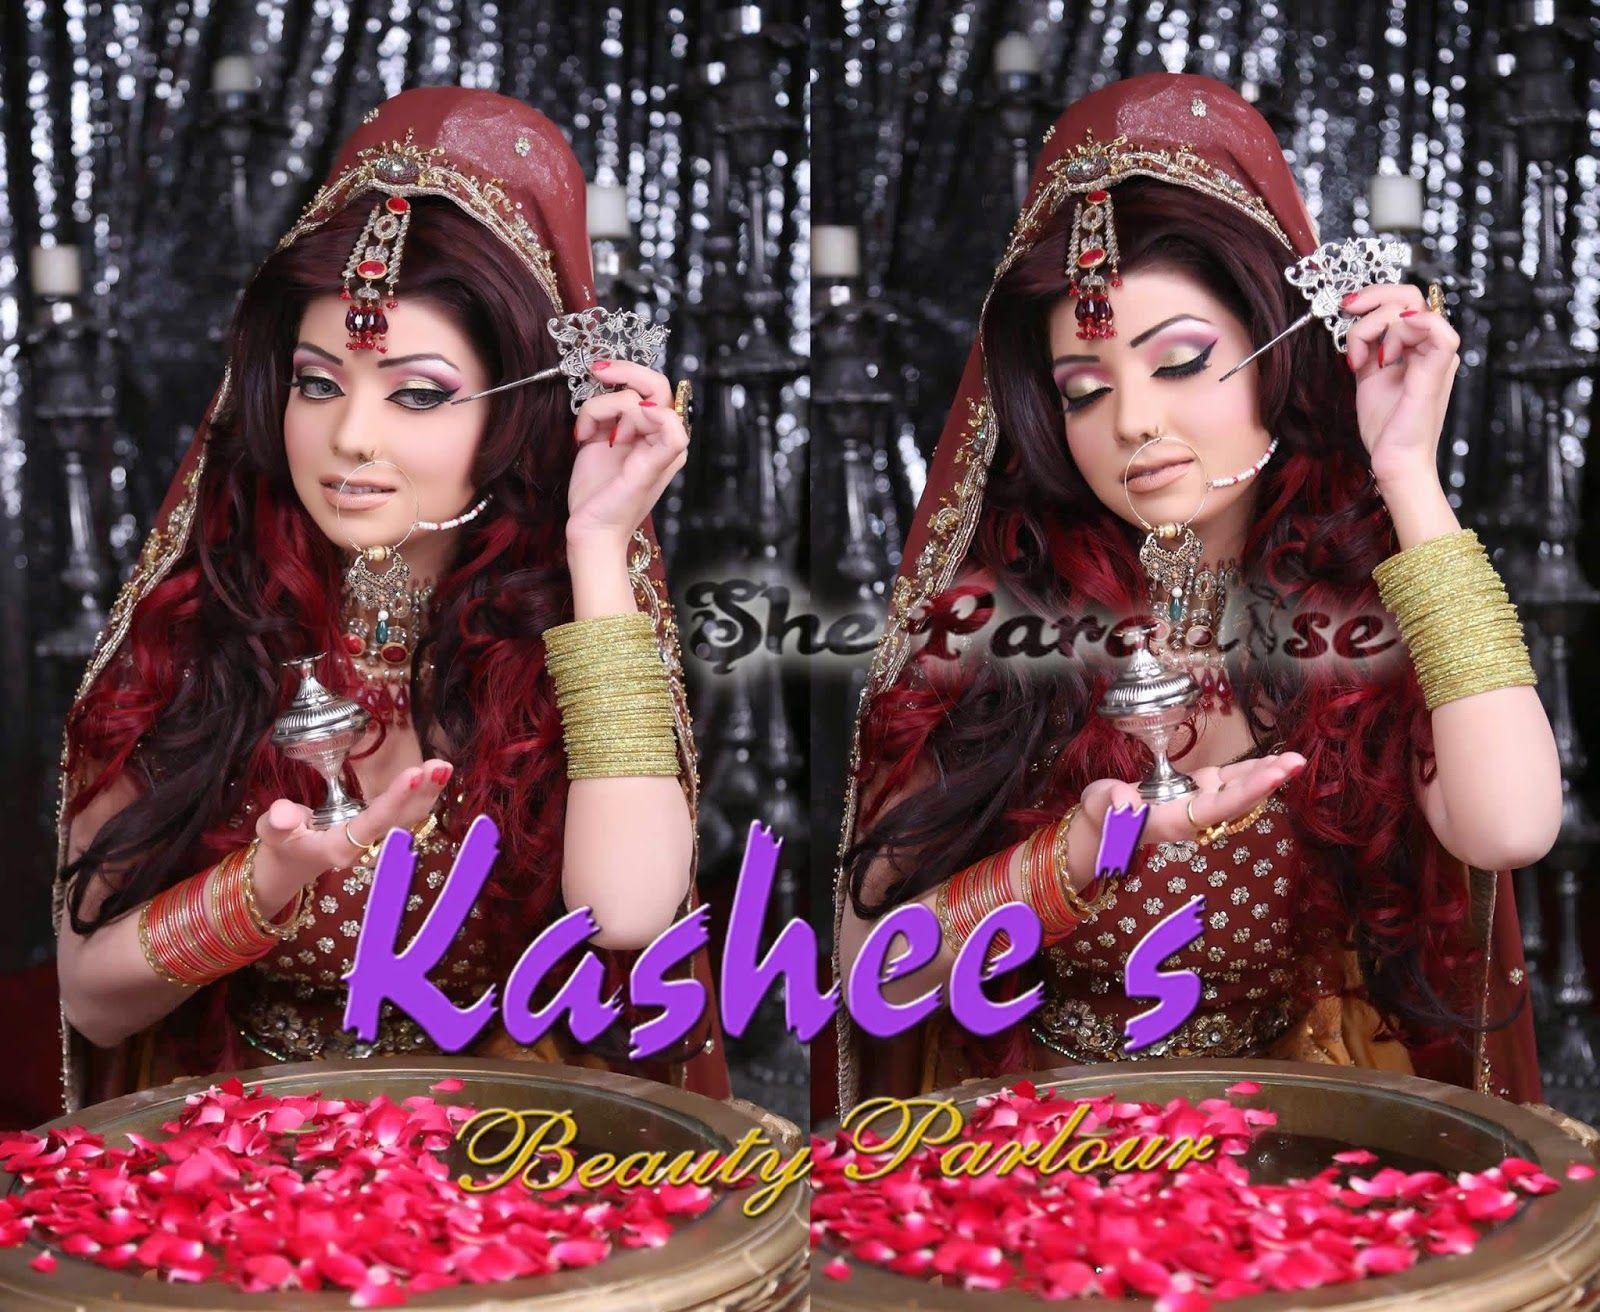 Kashee S Mehndi Makeup : Bridal makeup by kashee s beauty parlour sheparadise